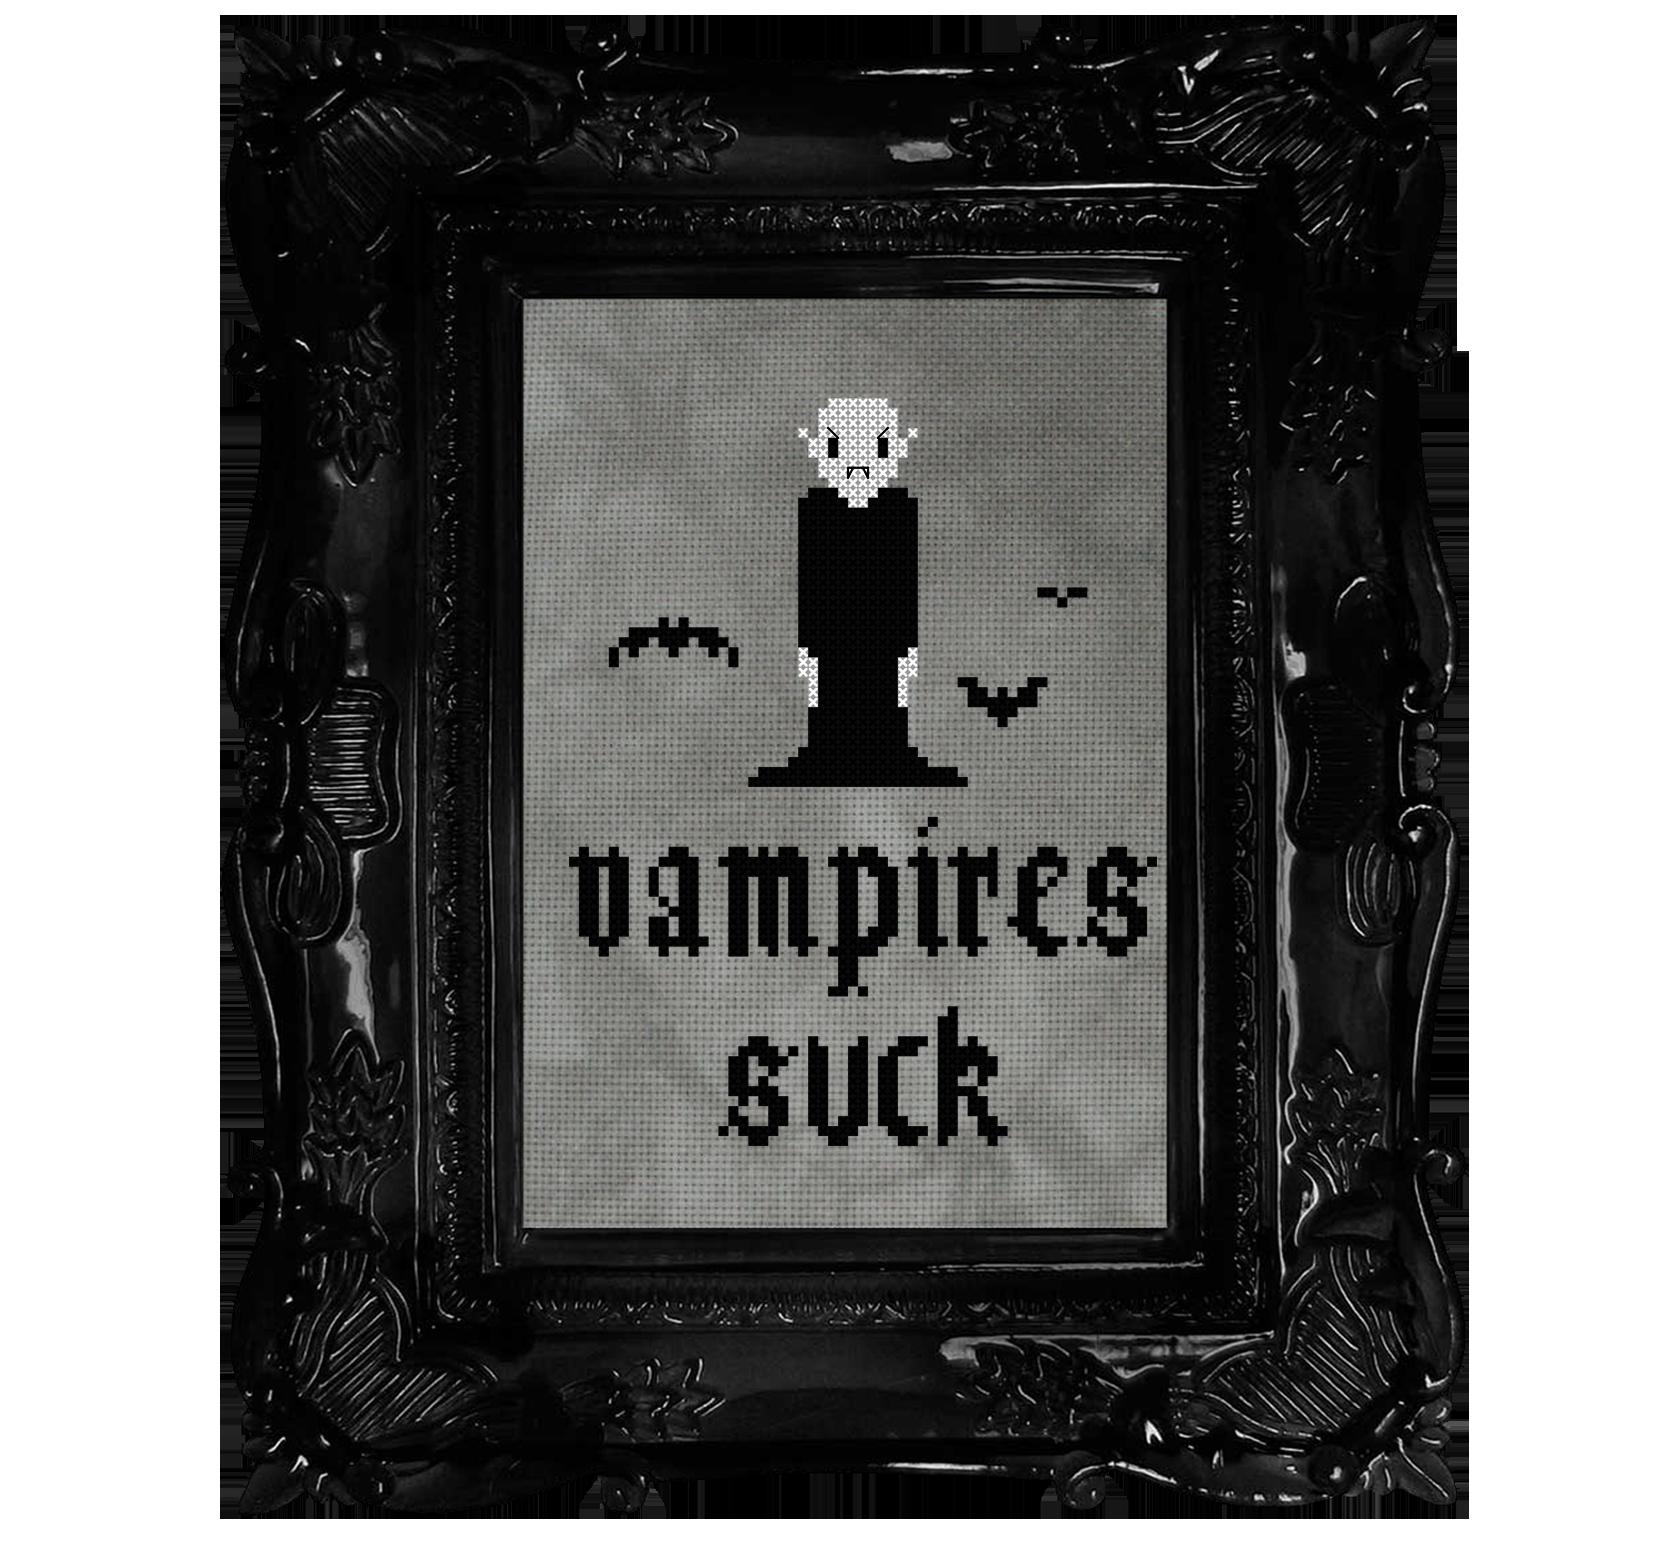 Vampires Suck - Count Orlock